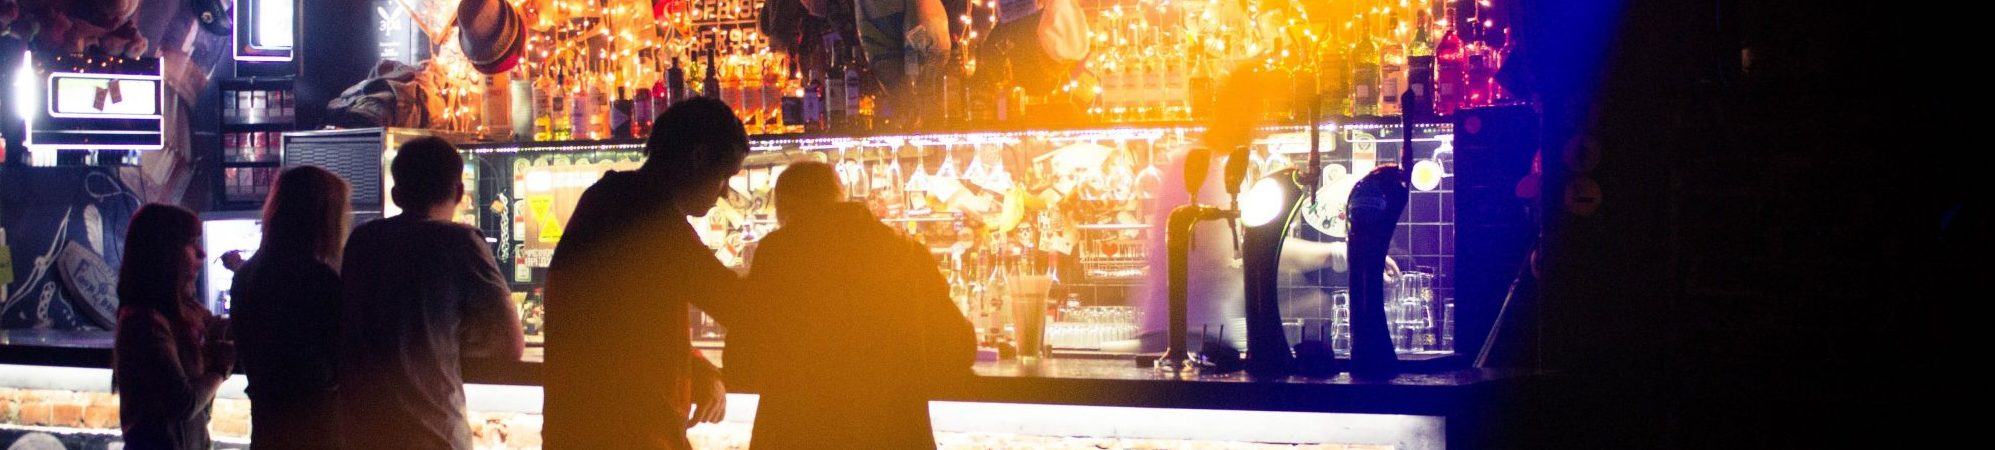 horeca vacature barman barvrouw